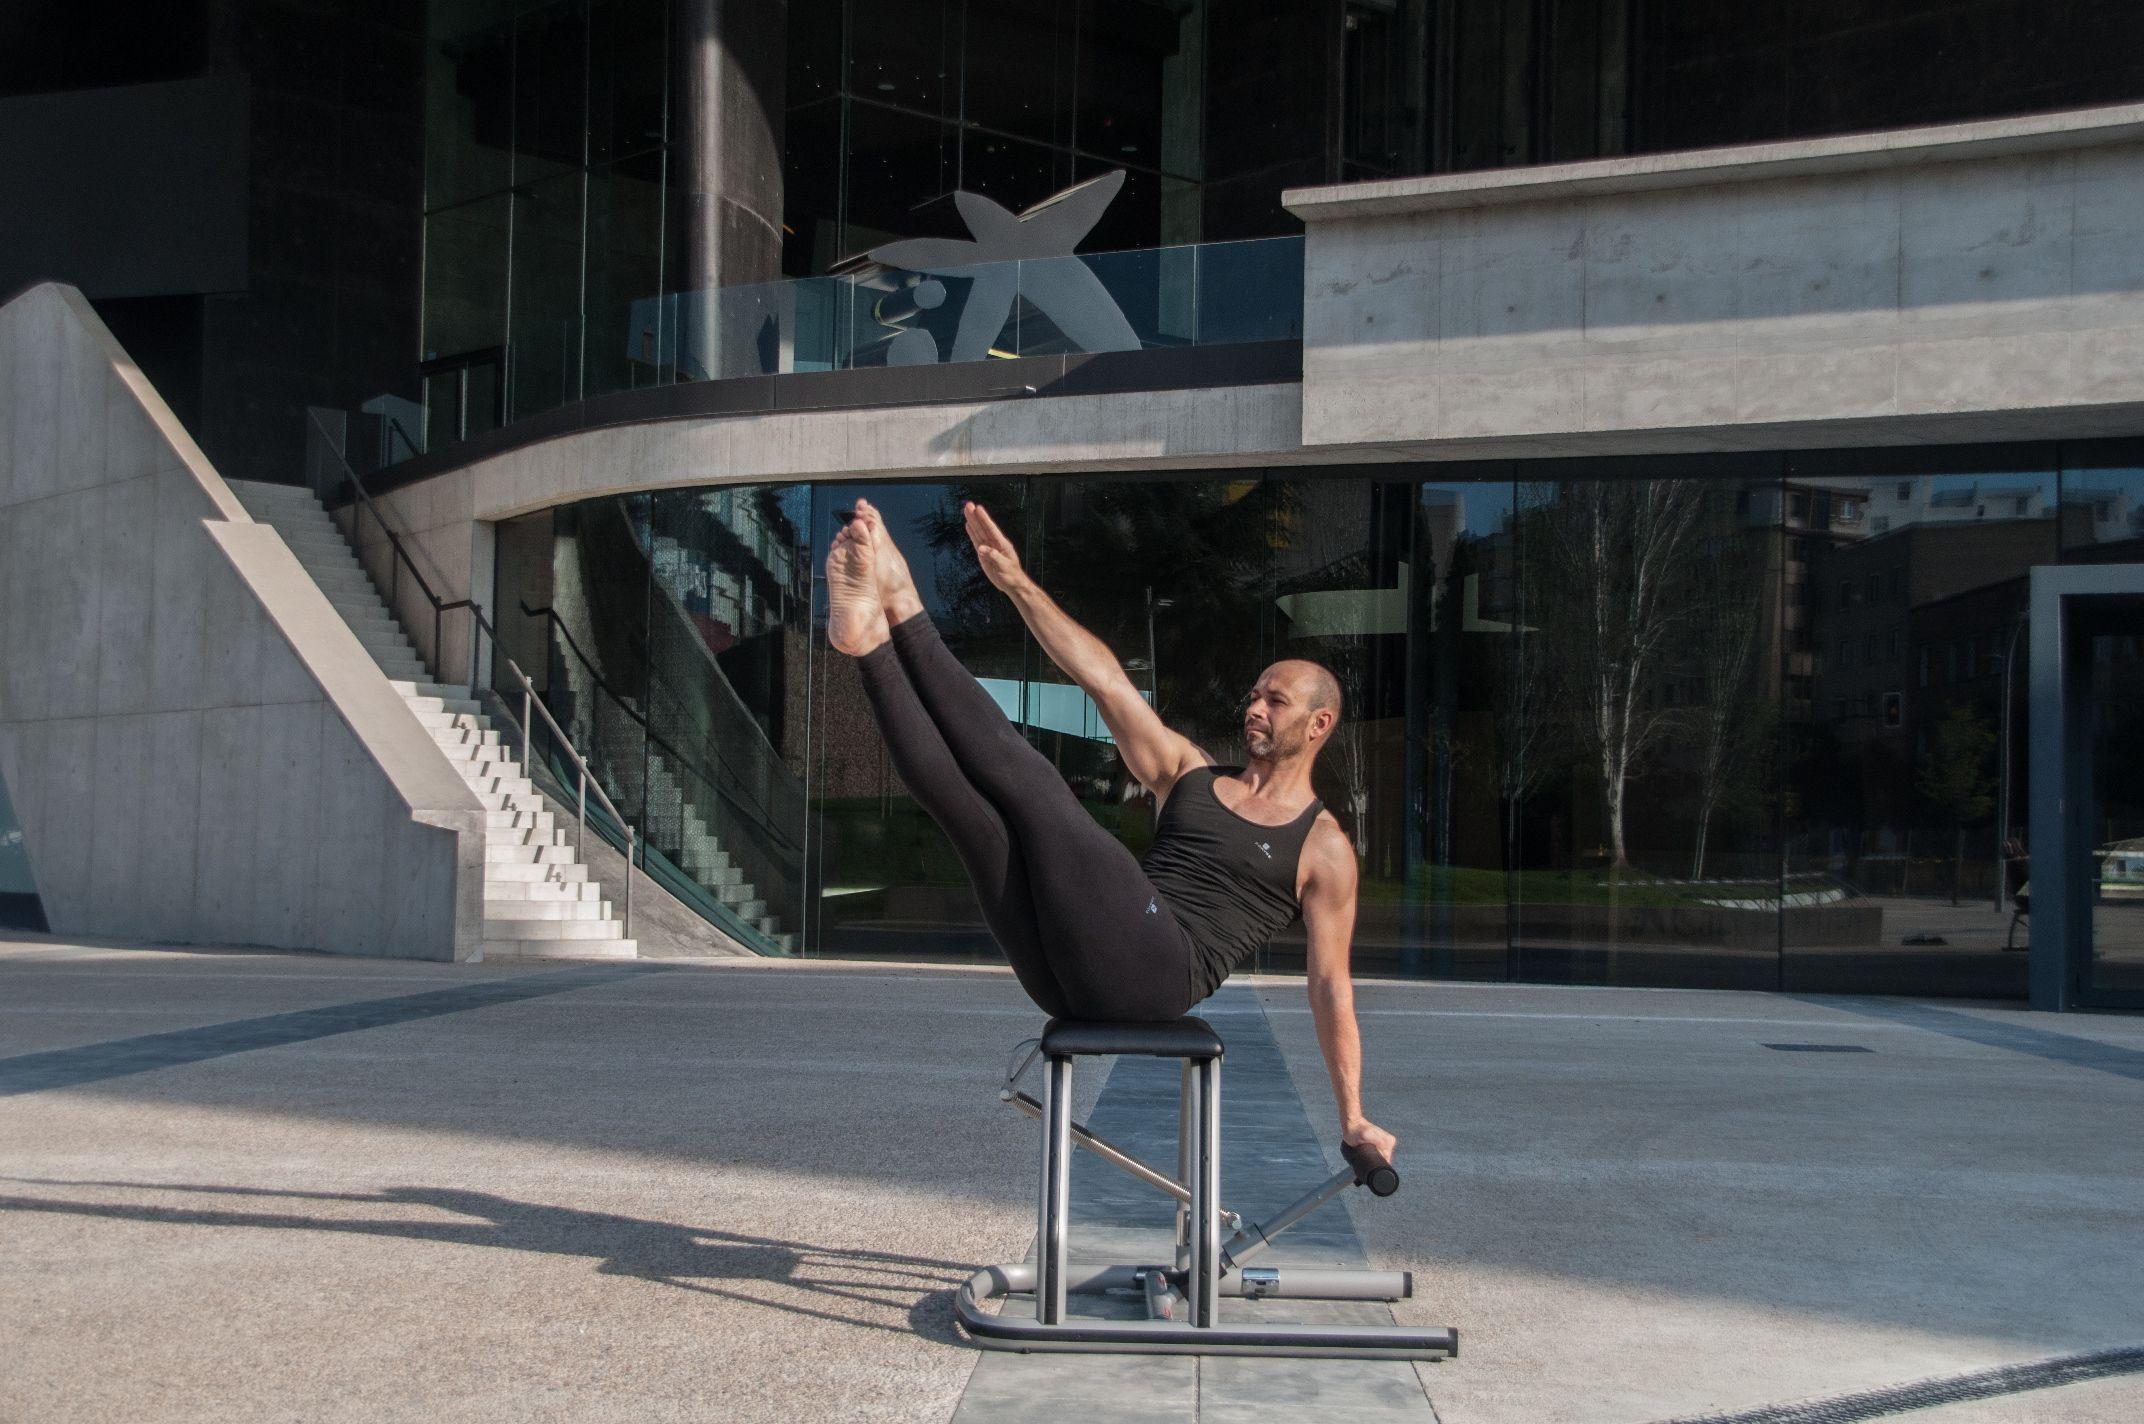 Pilates David Belio, clases de Pilates sin riego